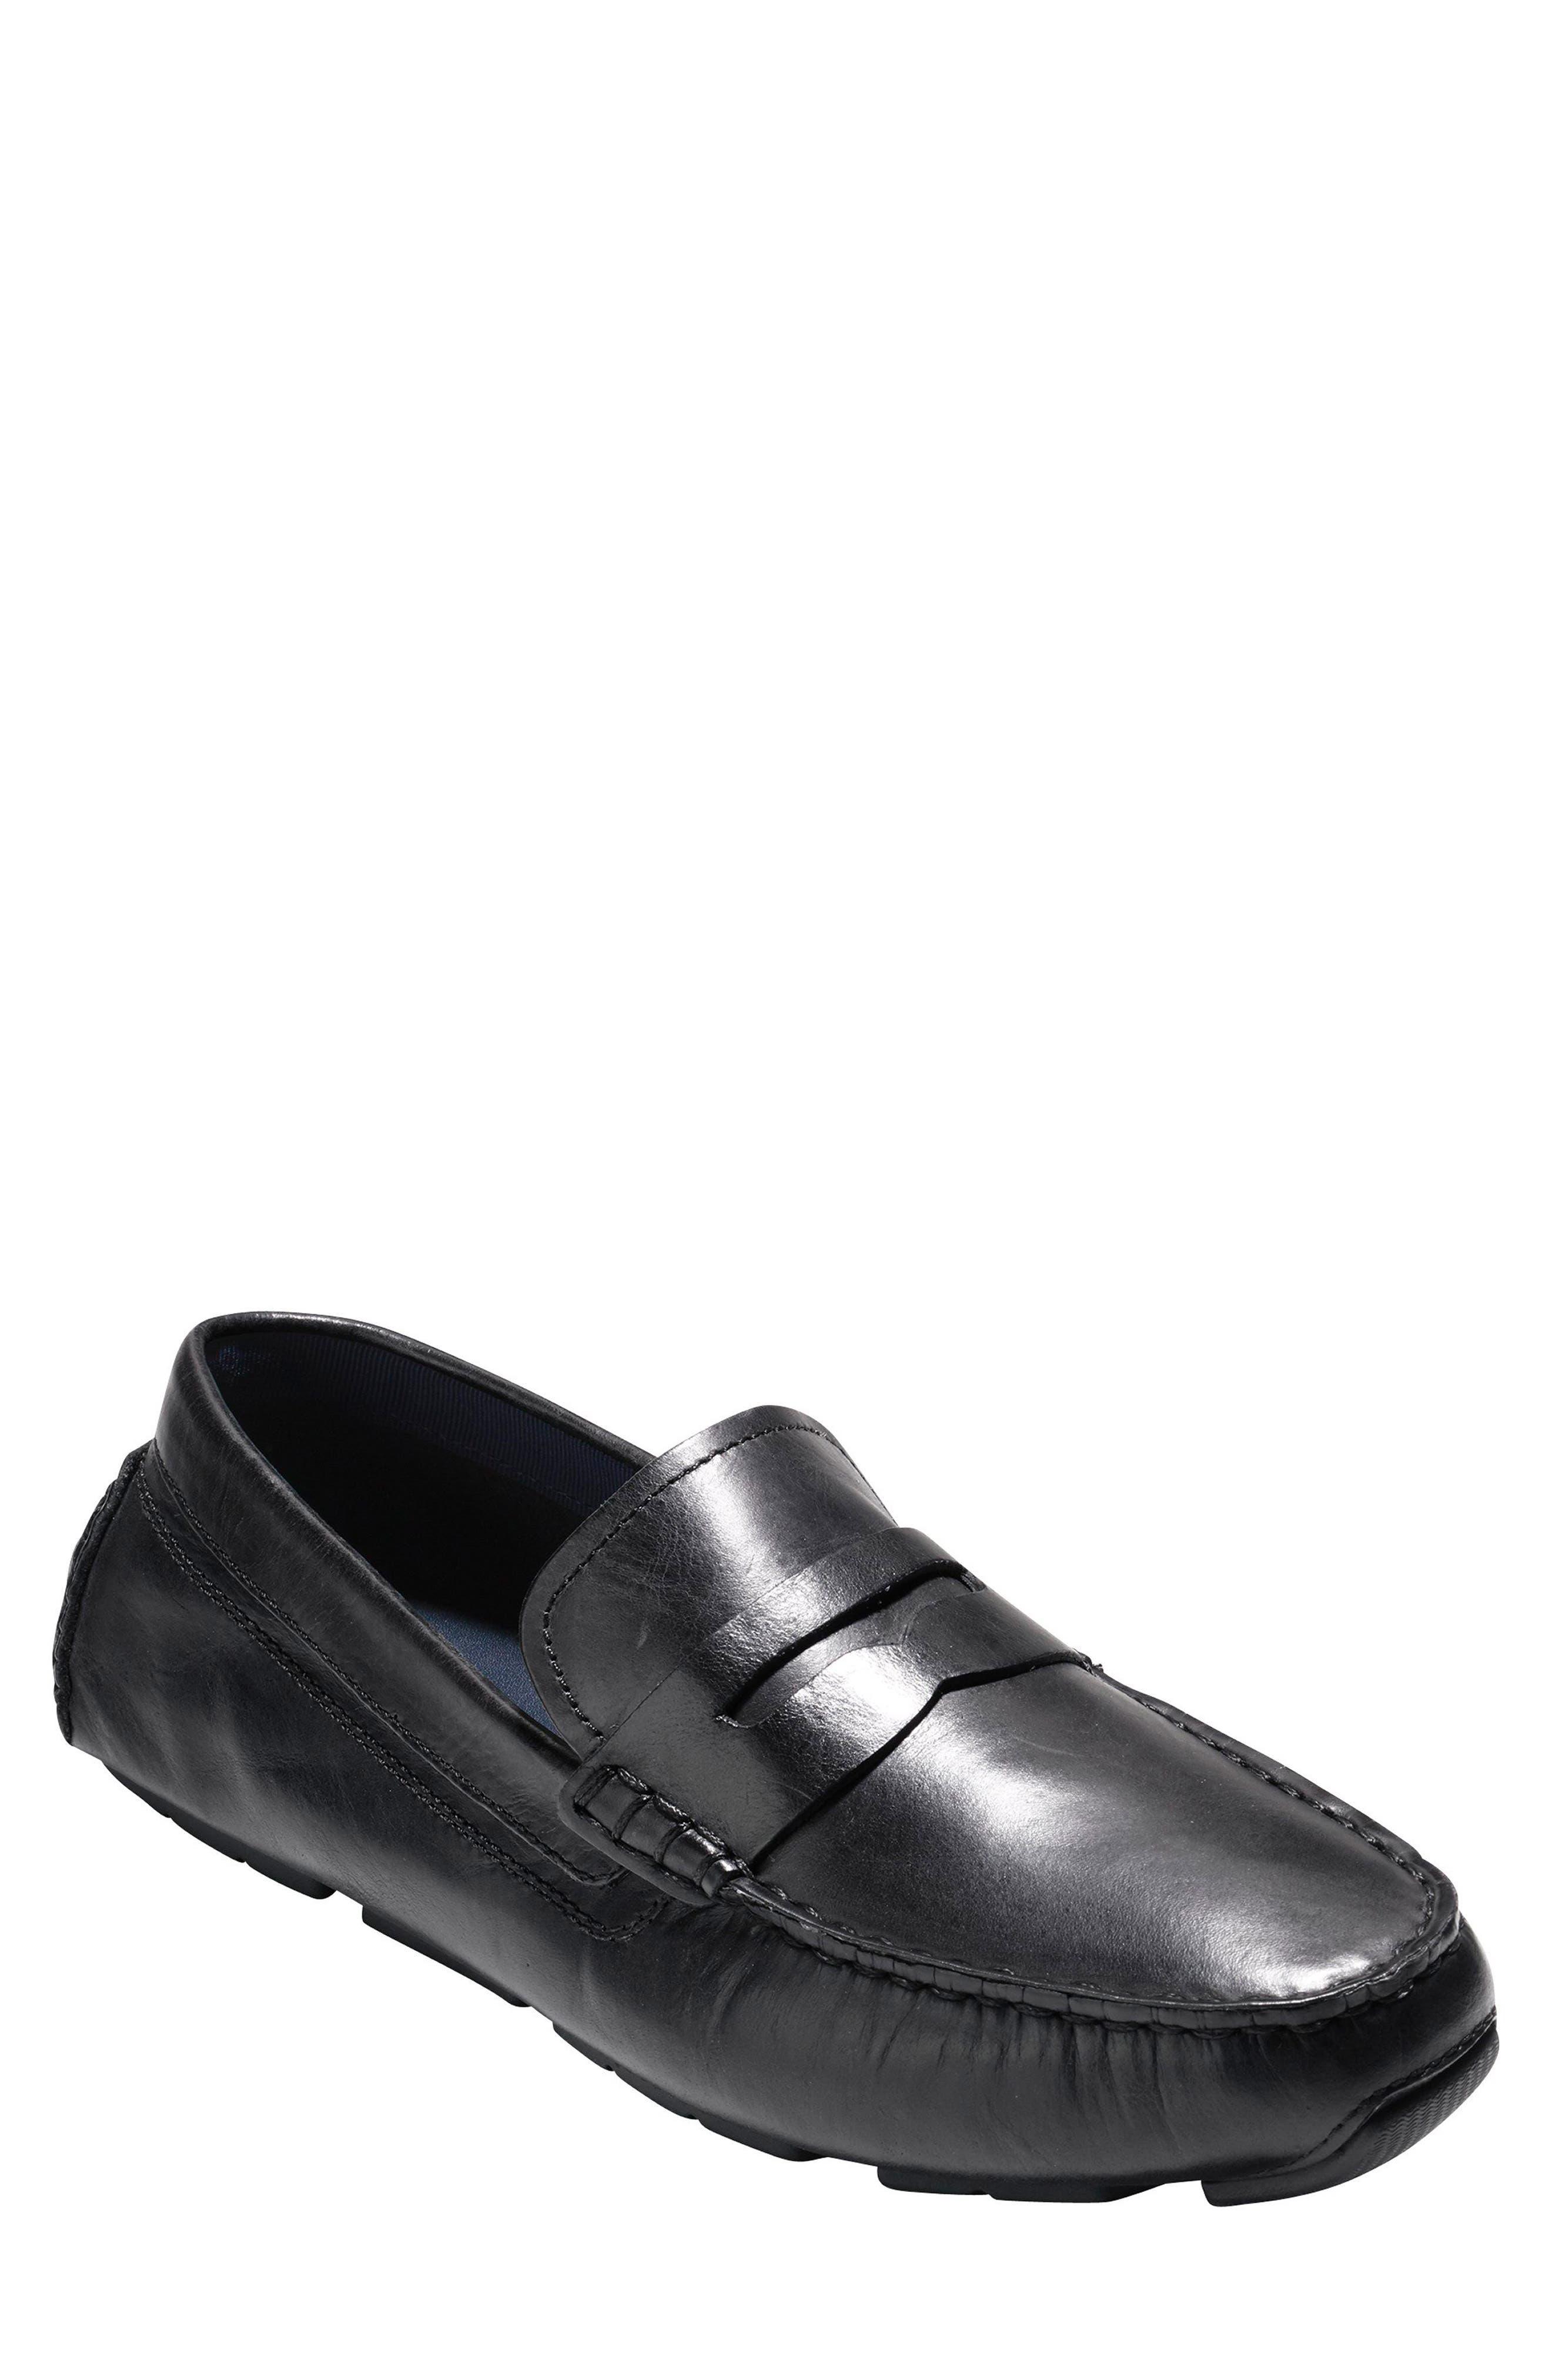 Kelson Driving Shoe,                         Main,                         color, Black